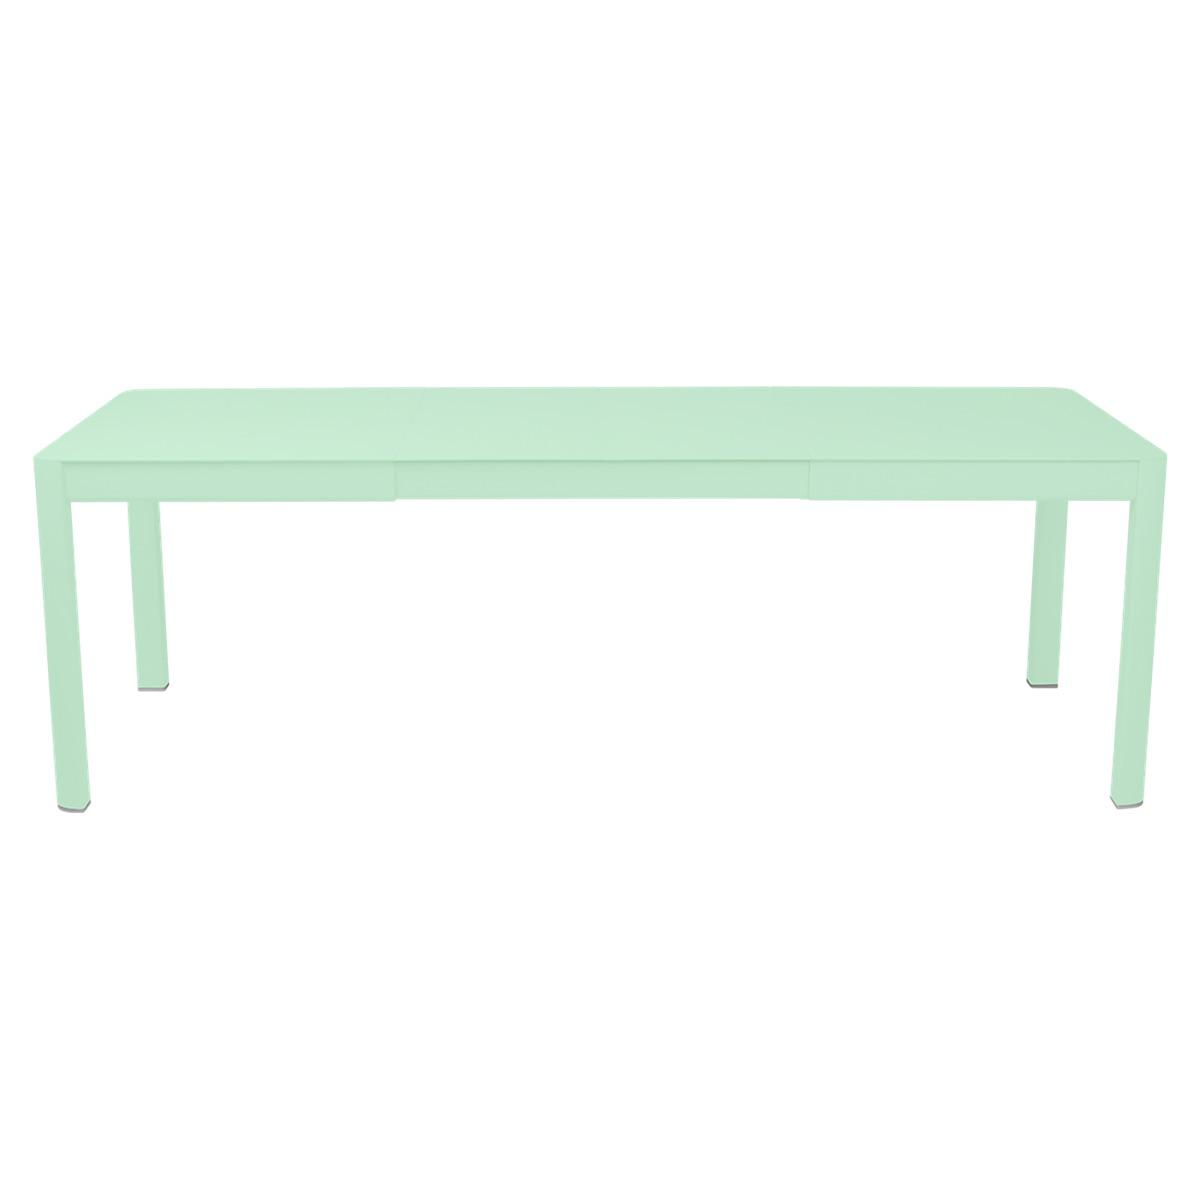 Table à rallonge 149/234x100cm RIBAMBELLE Fermob vert opaline